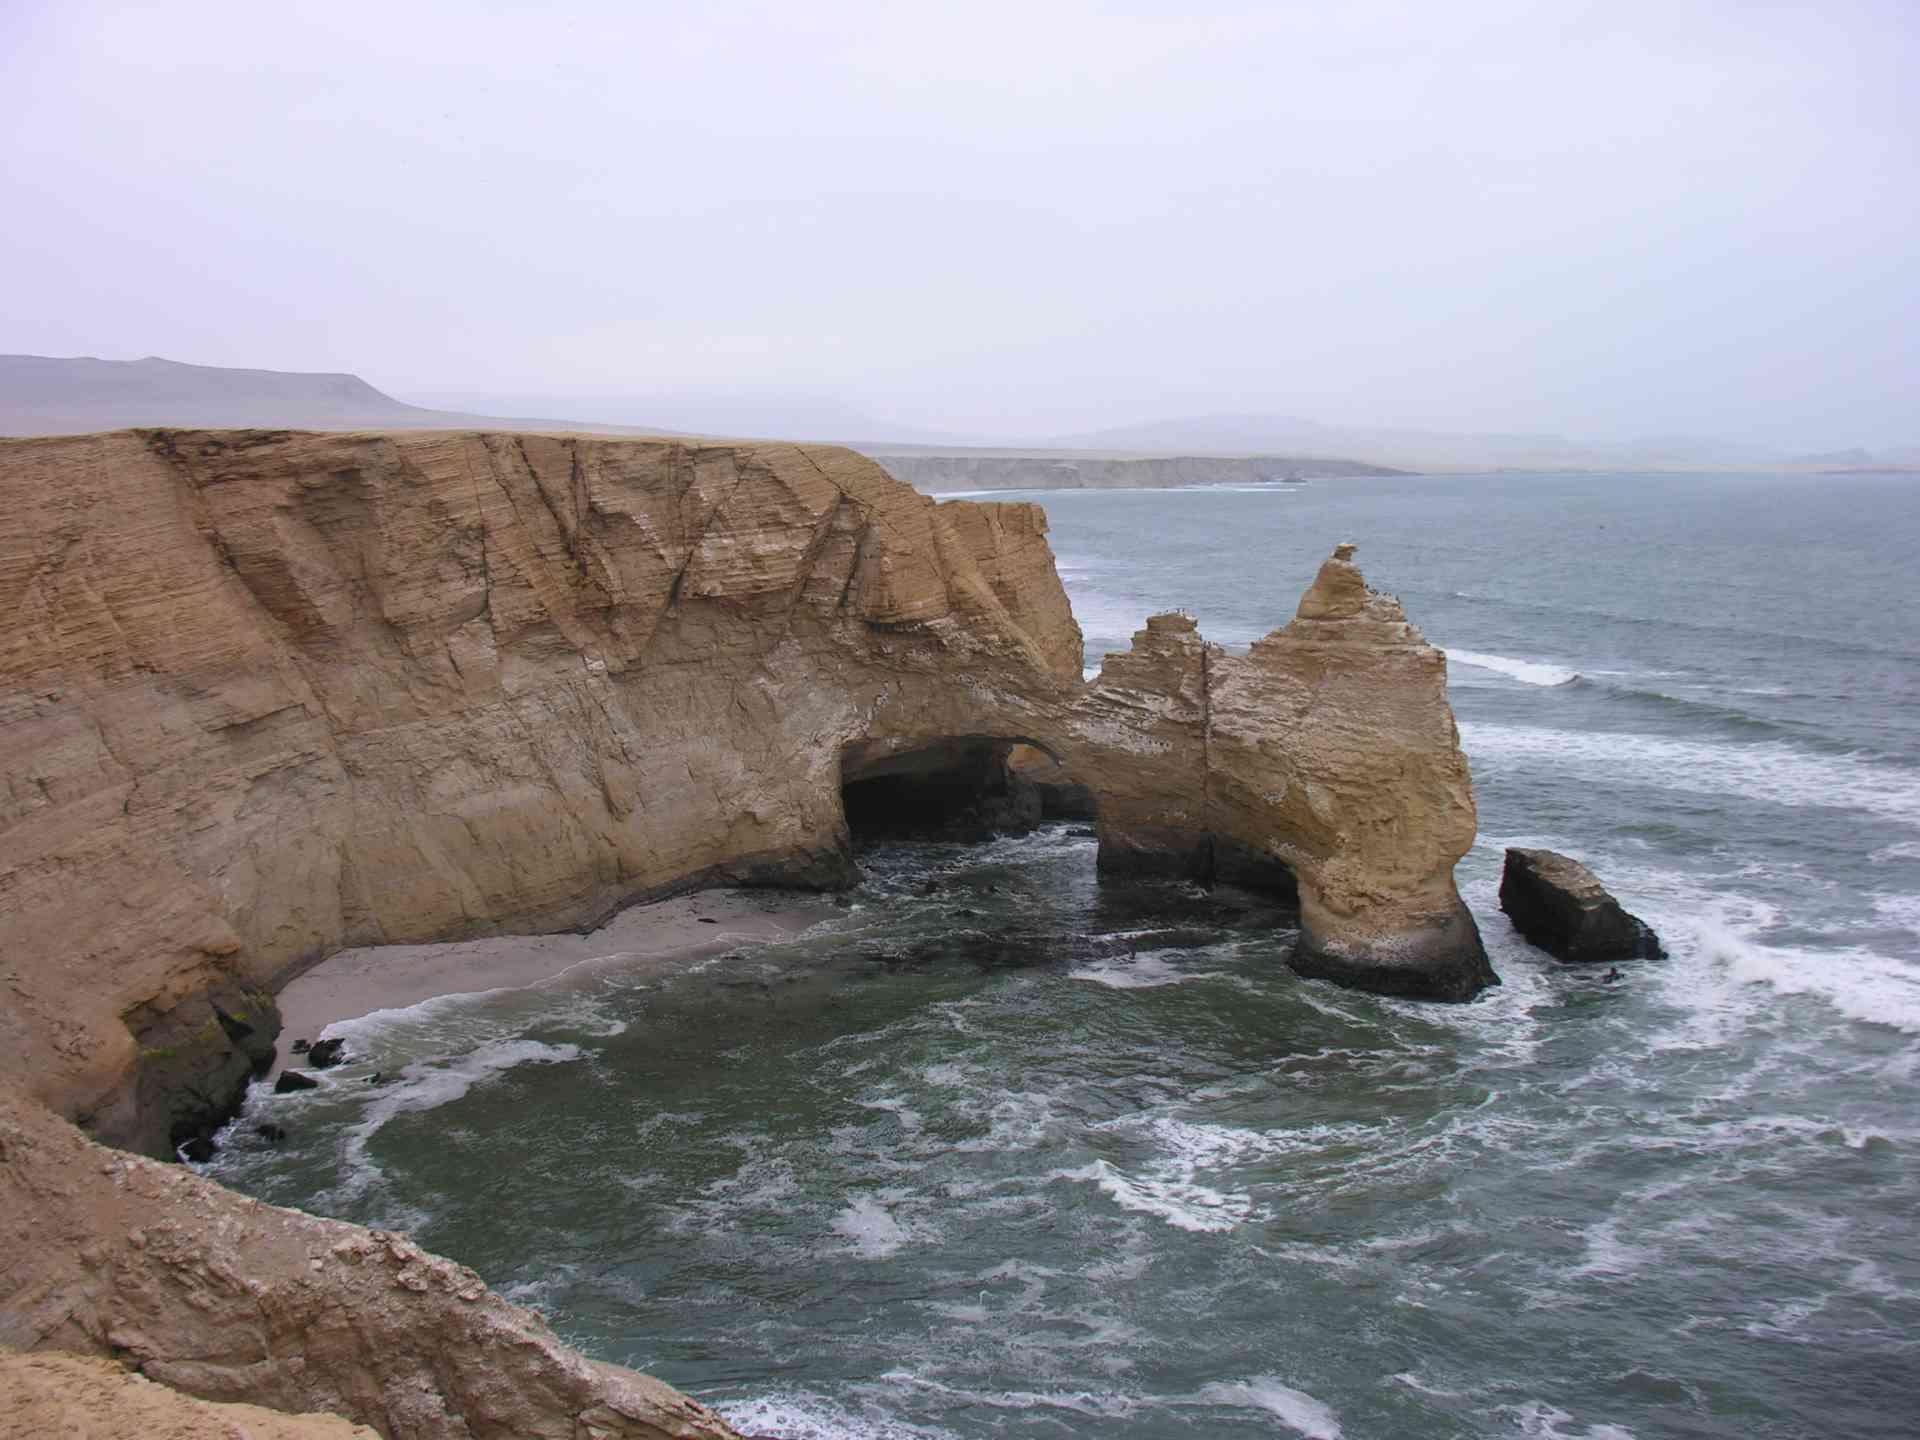 Ballestas Islands, Peru by Marion Bunnik